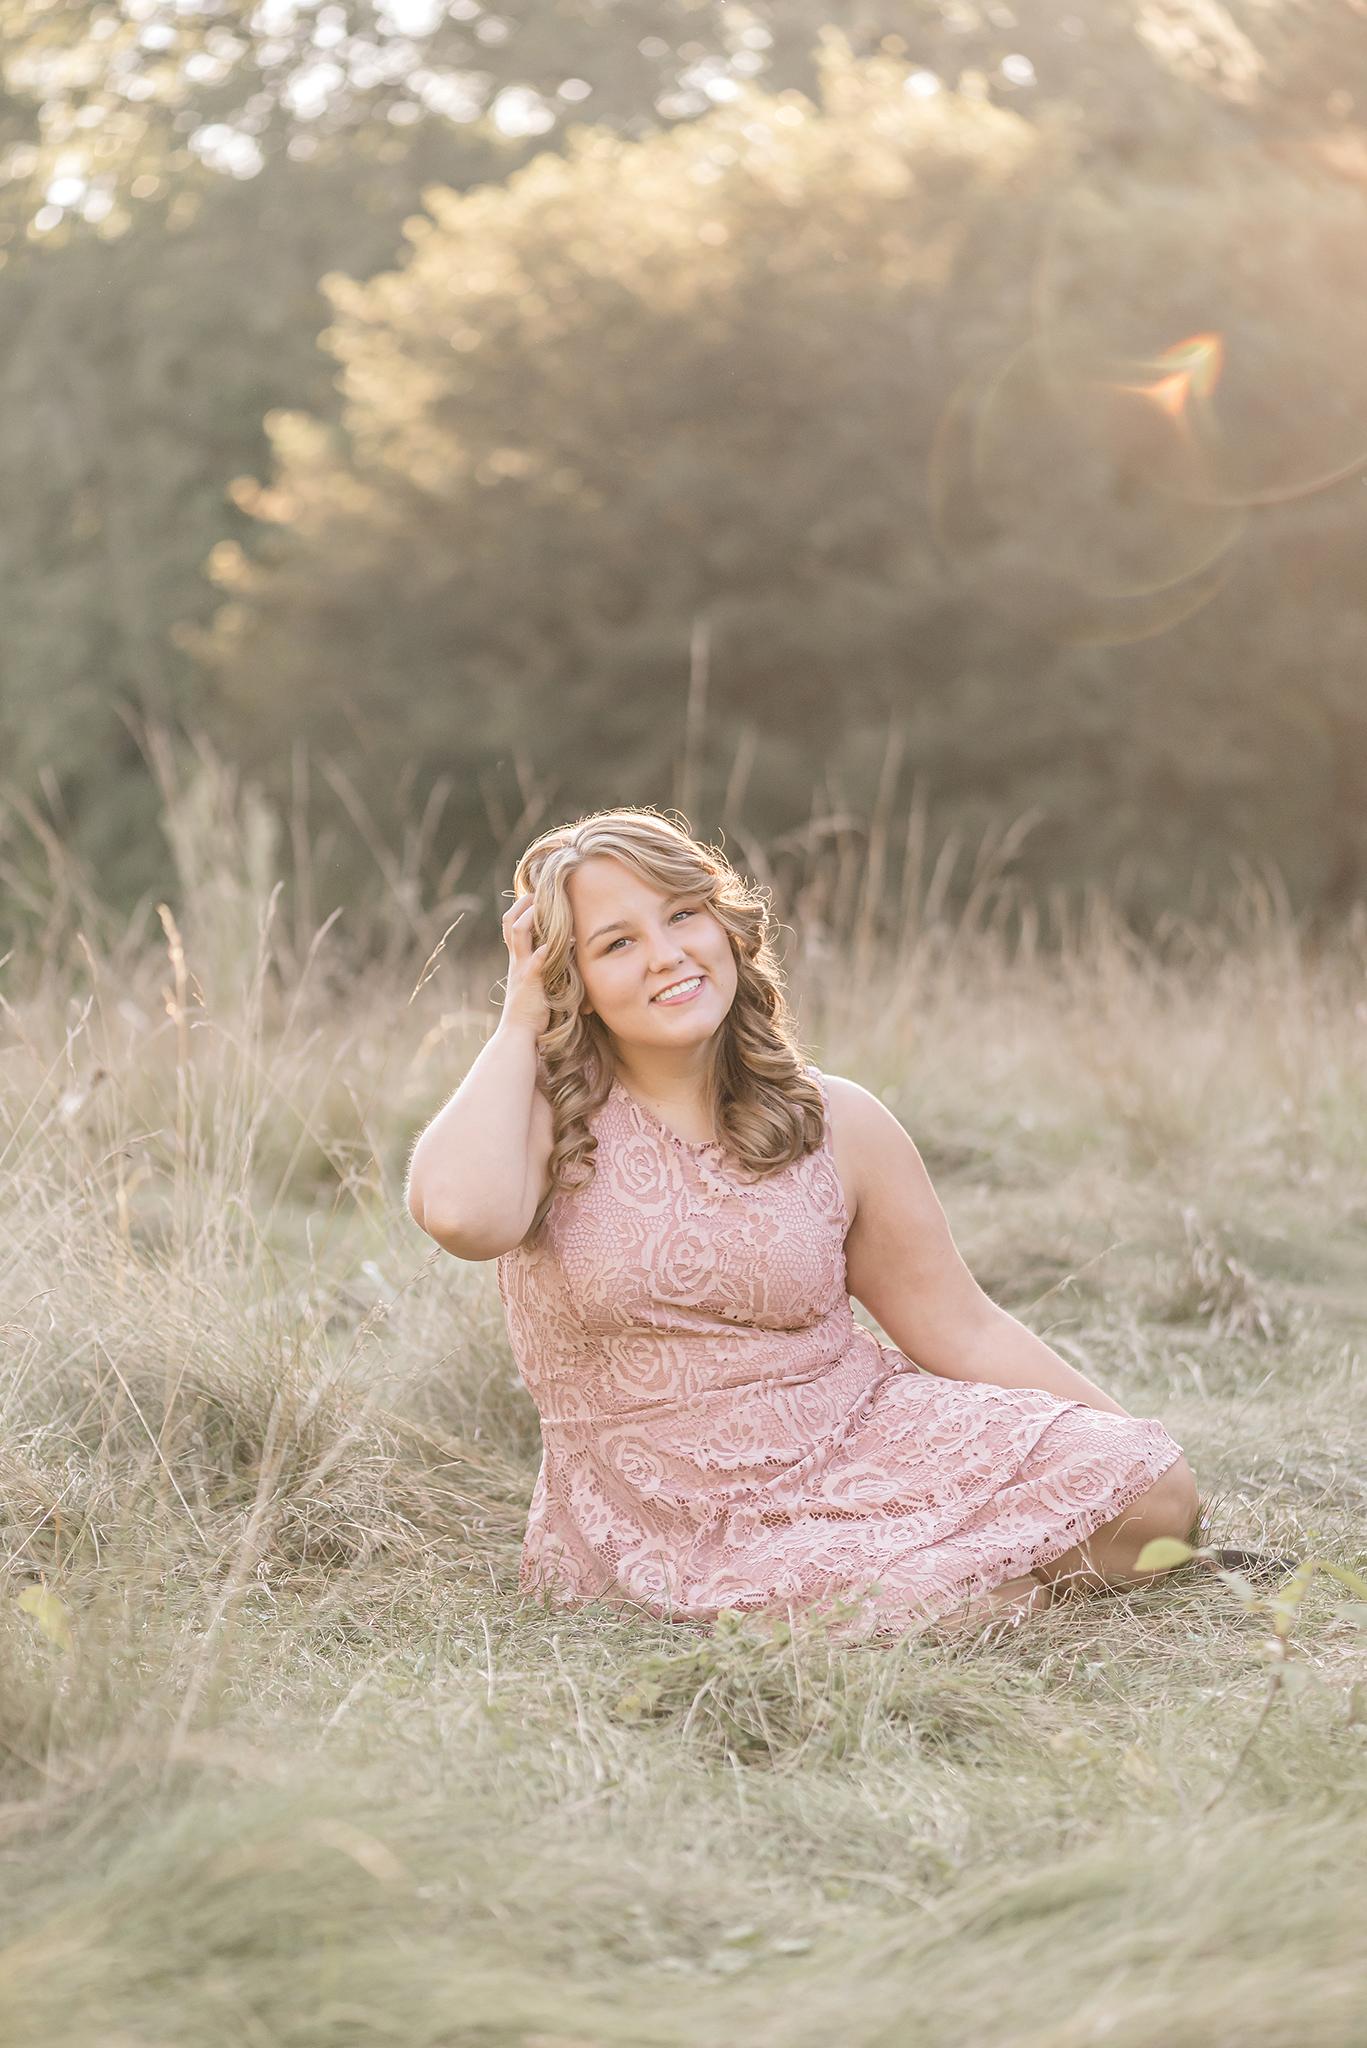 Lindsay-Adkins-Photography-Michigan-Senior-Portrait-Photographer